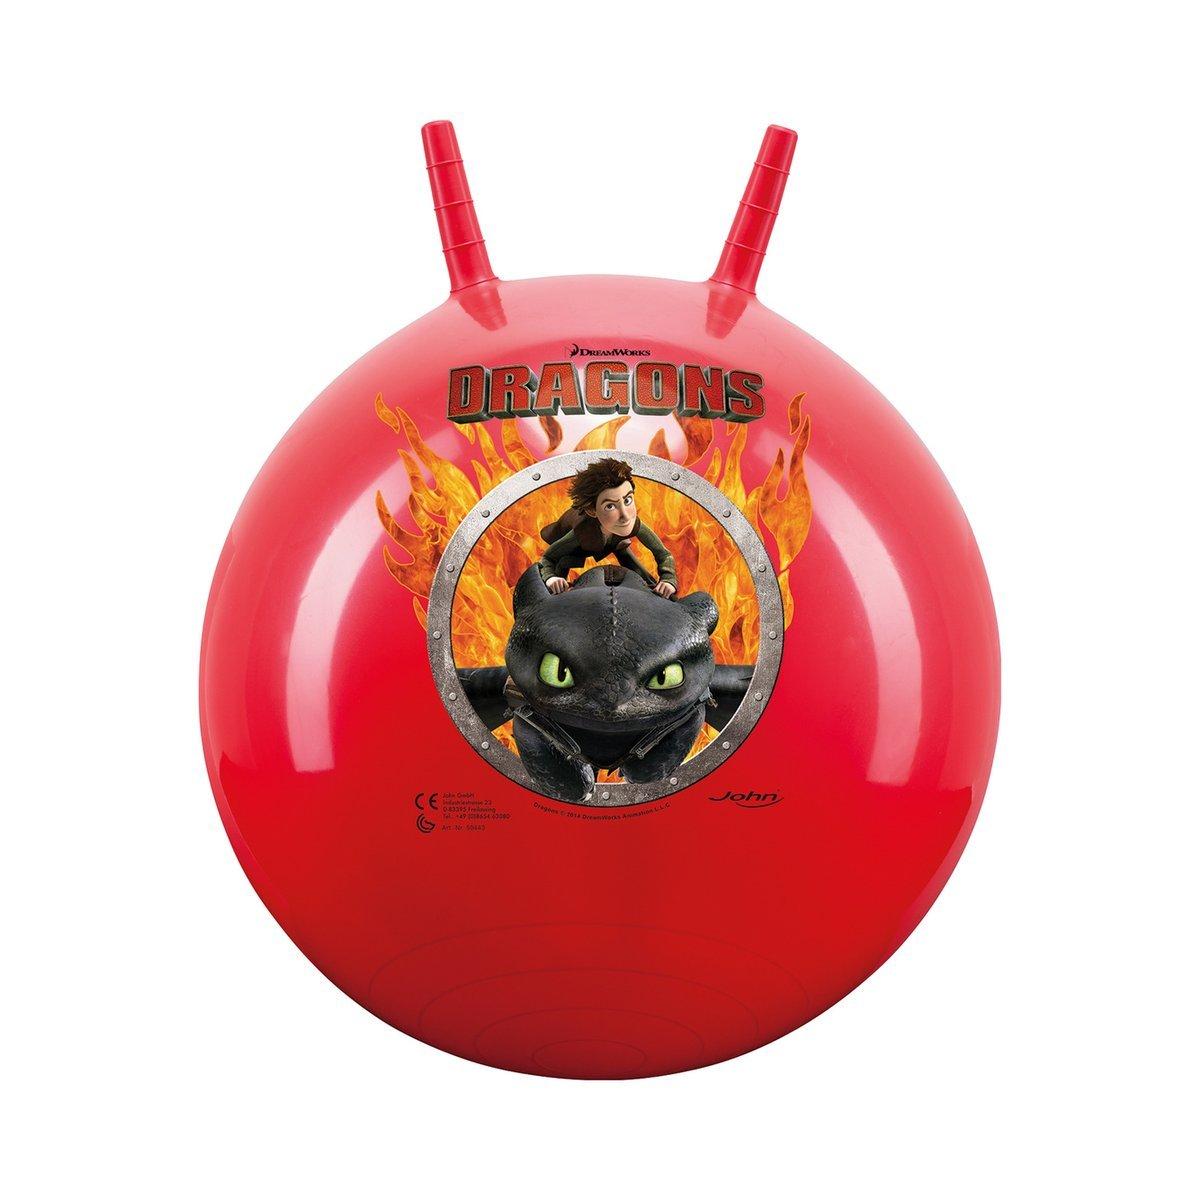 John Jump Ball Dragons Space Hopper Ball Kids Bouncing Ball Game Unknown 59443